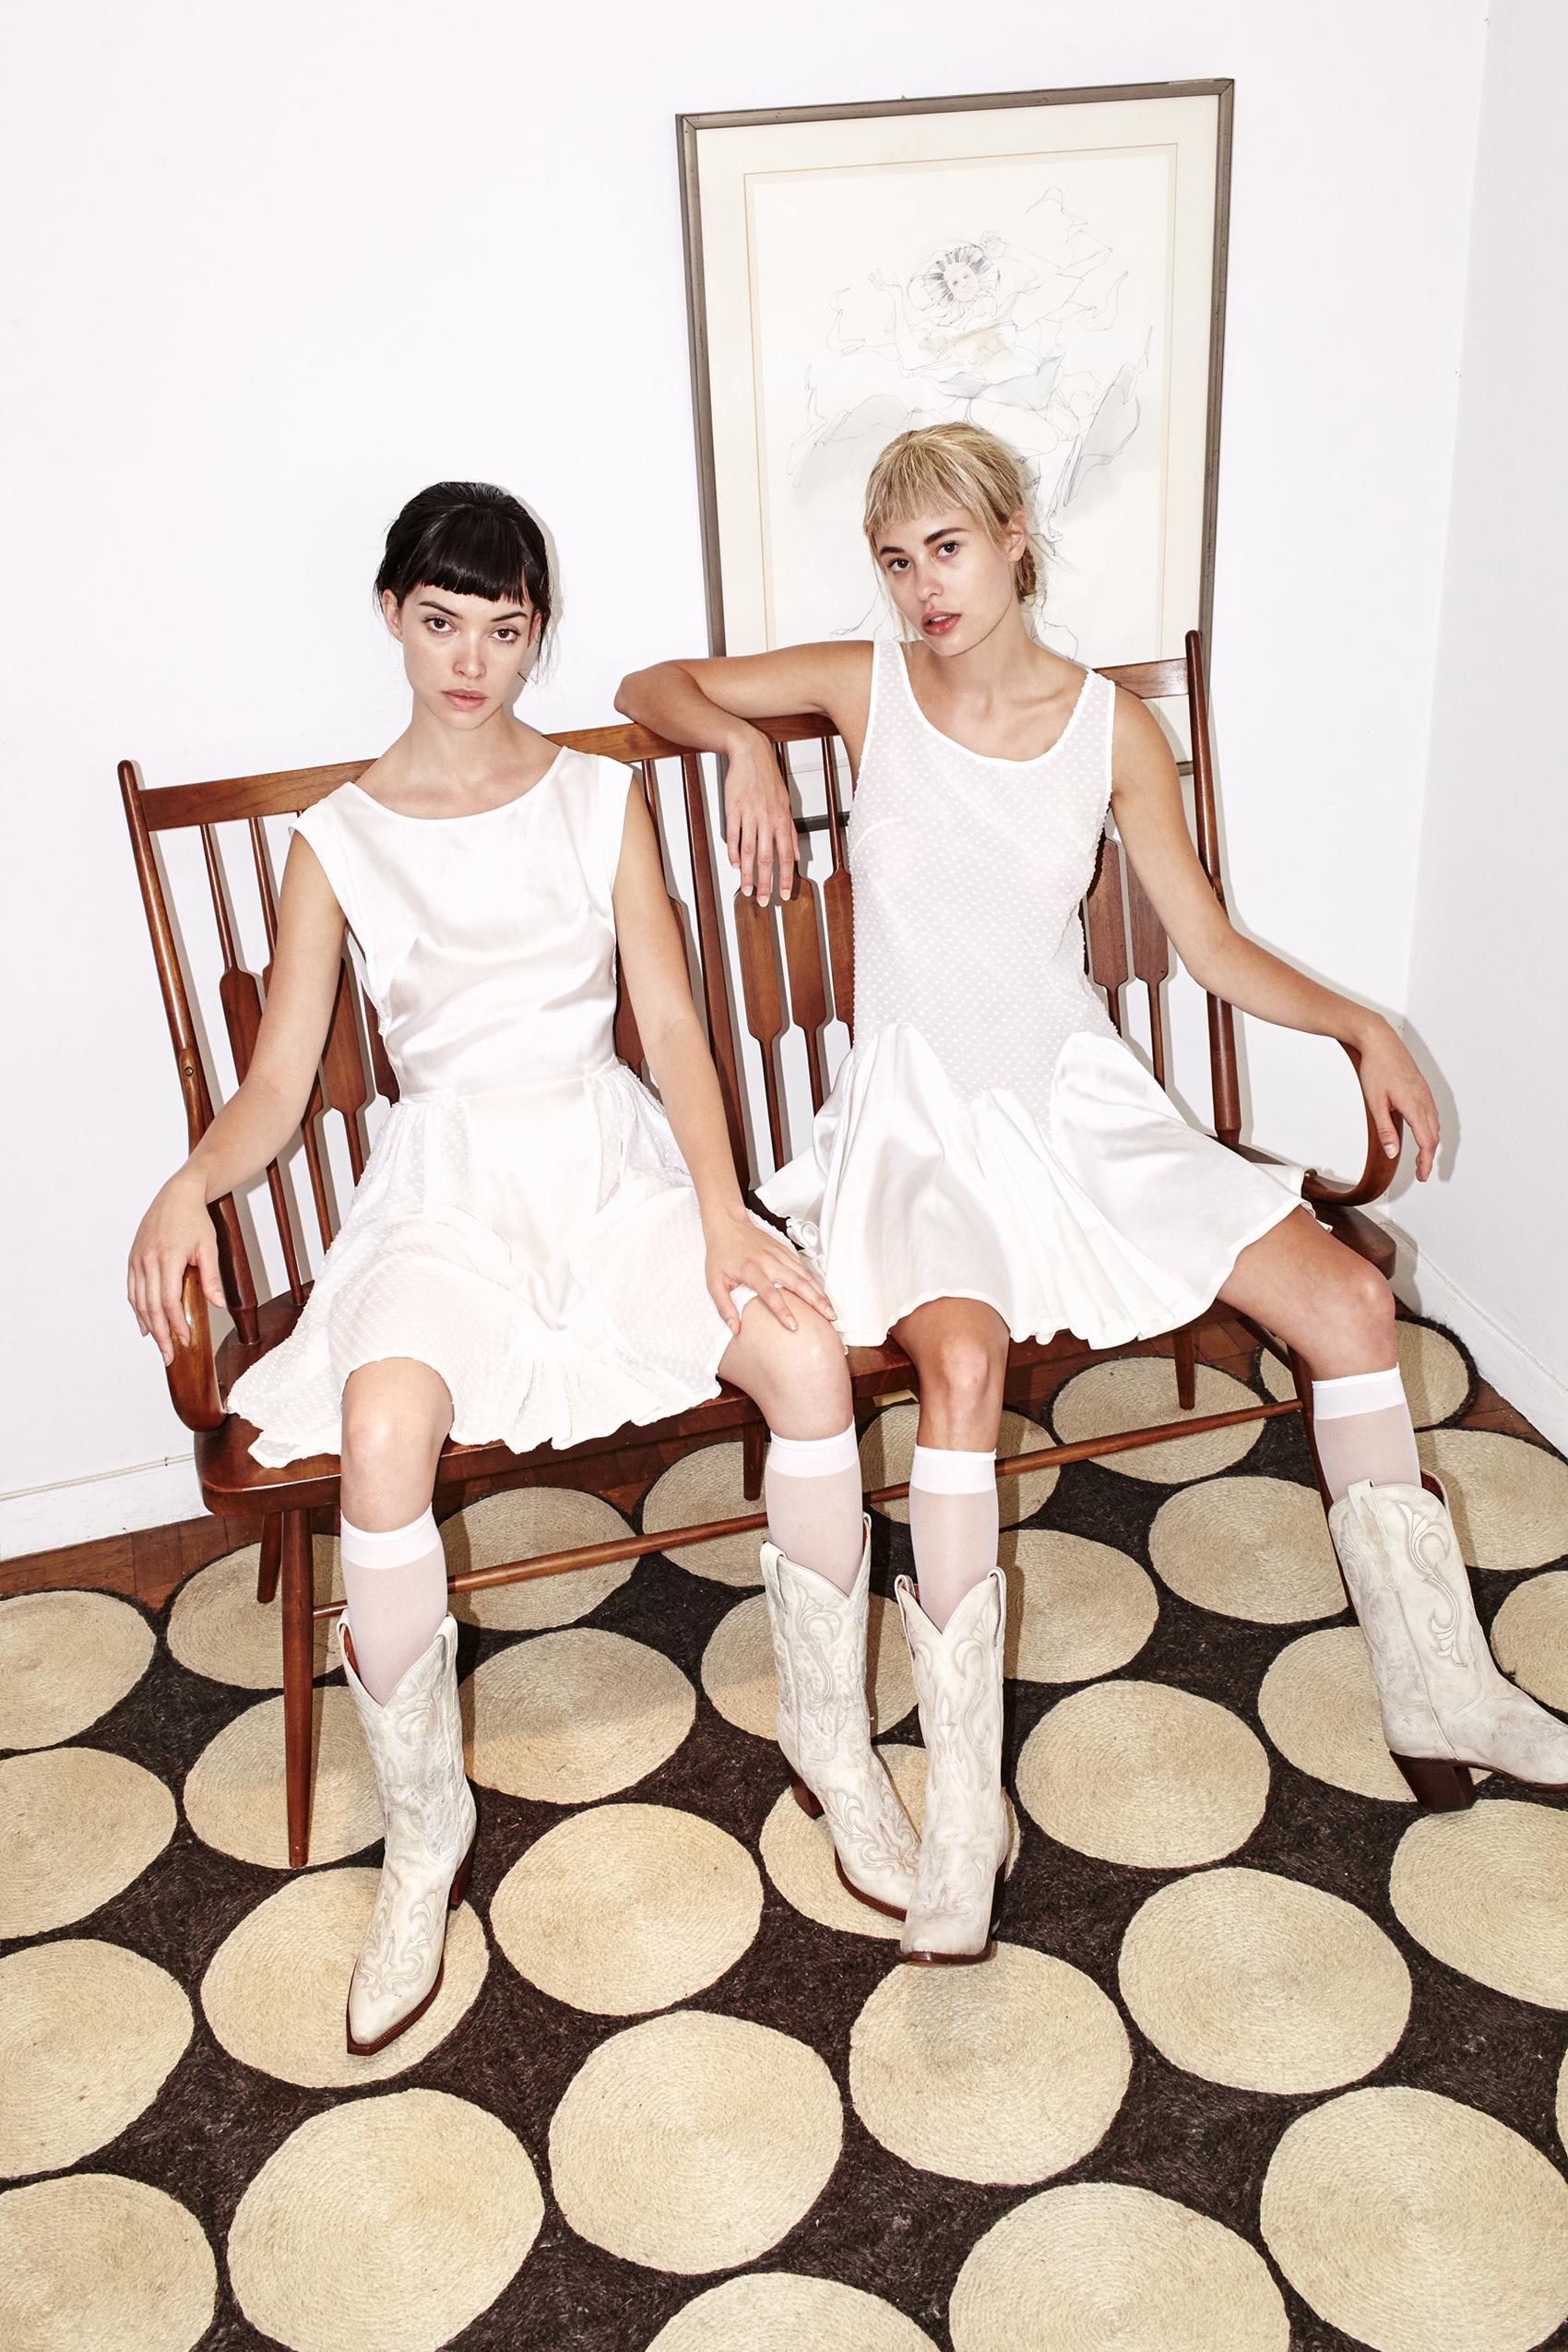 kelsey randall white cream cotton silk swiss dot shirt dress godet babydoll tea time party day bridal bridesmaid rehearsal dinner dress